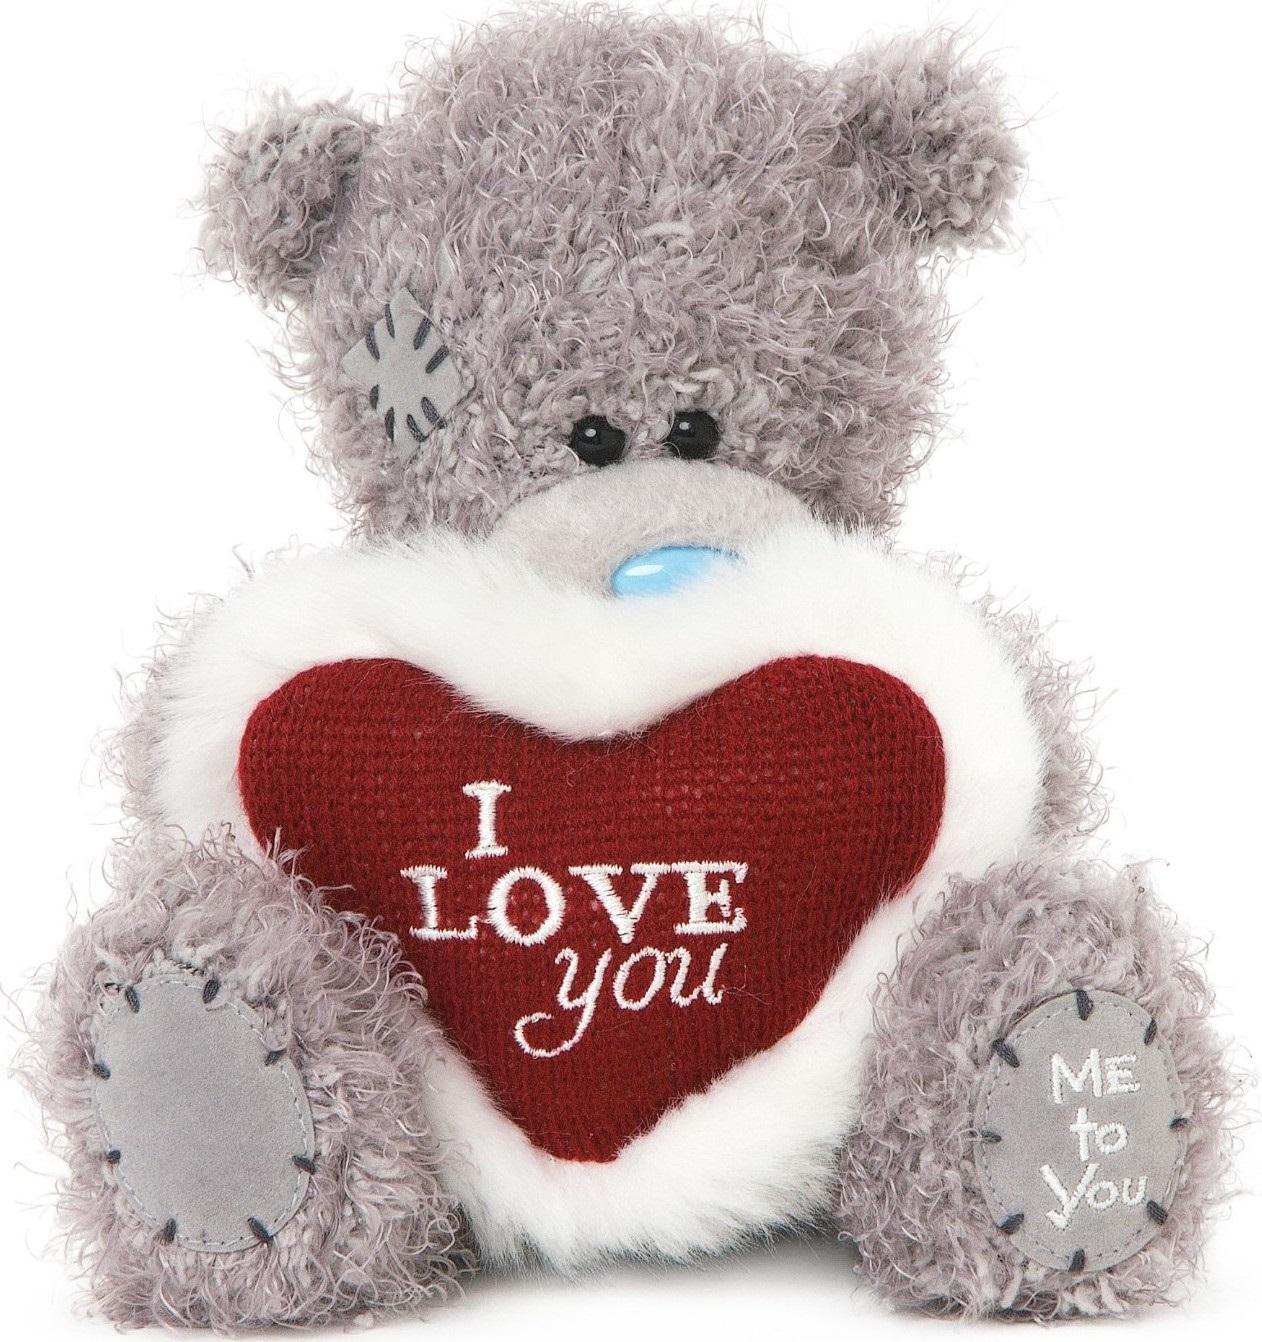 Me to You Medvídek se srdcem s nápisem I Love You 15 cm